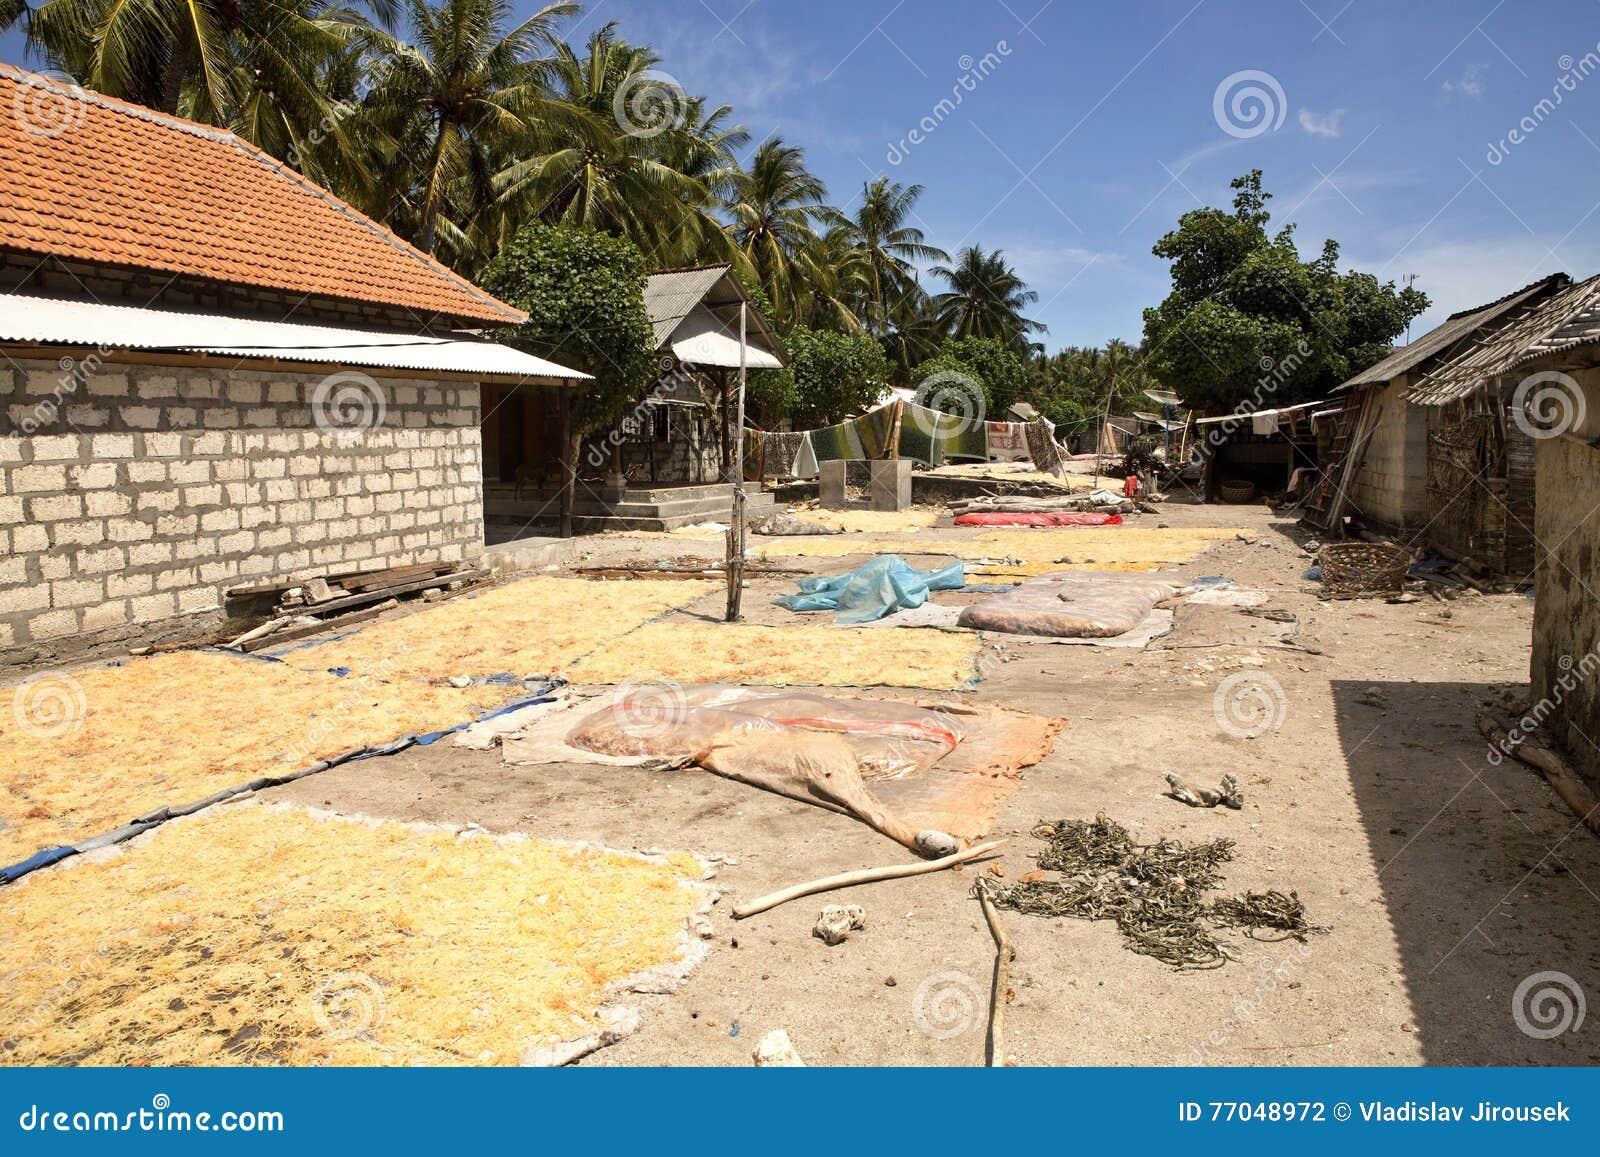 Fattiga kojahavsväxtodlare, Nusa Penida, Indonesien